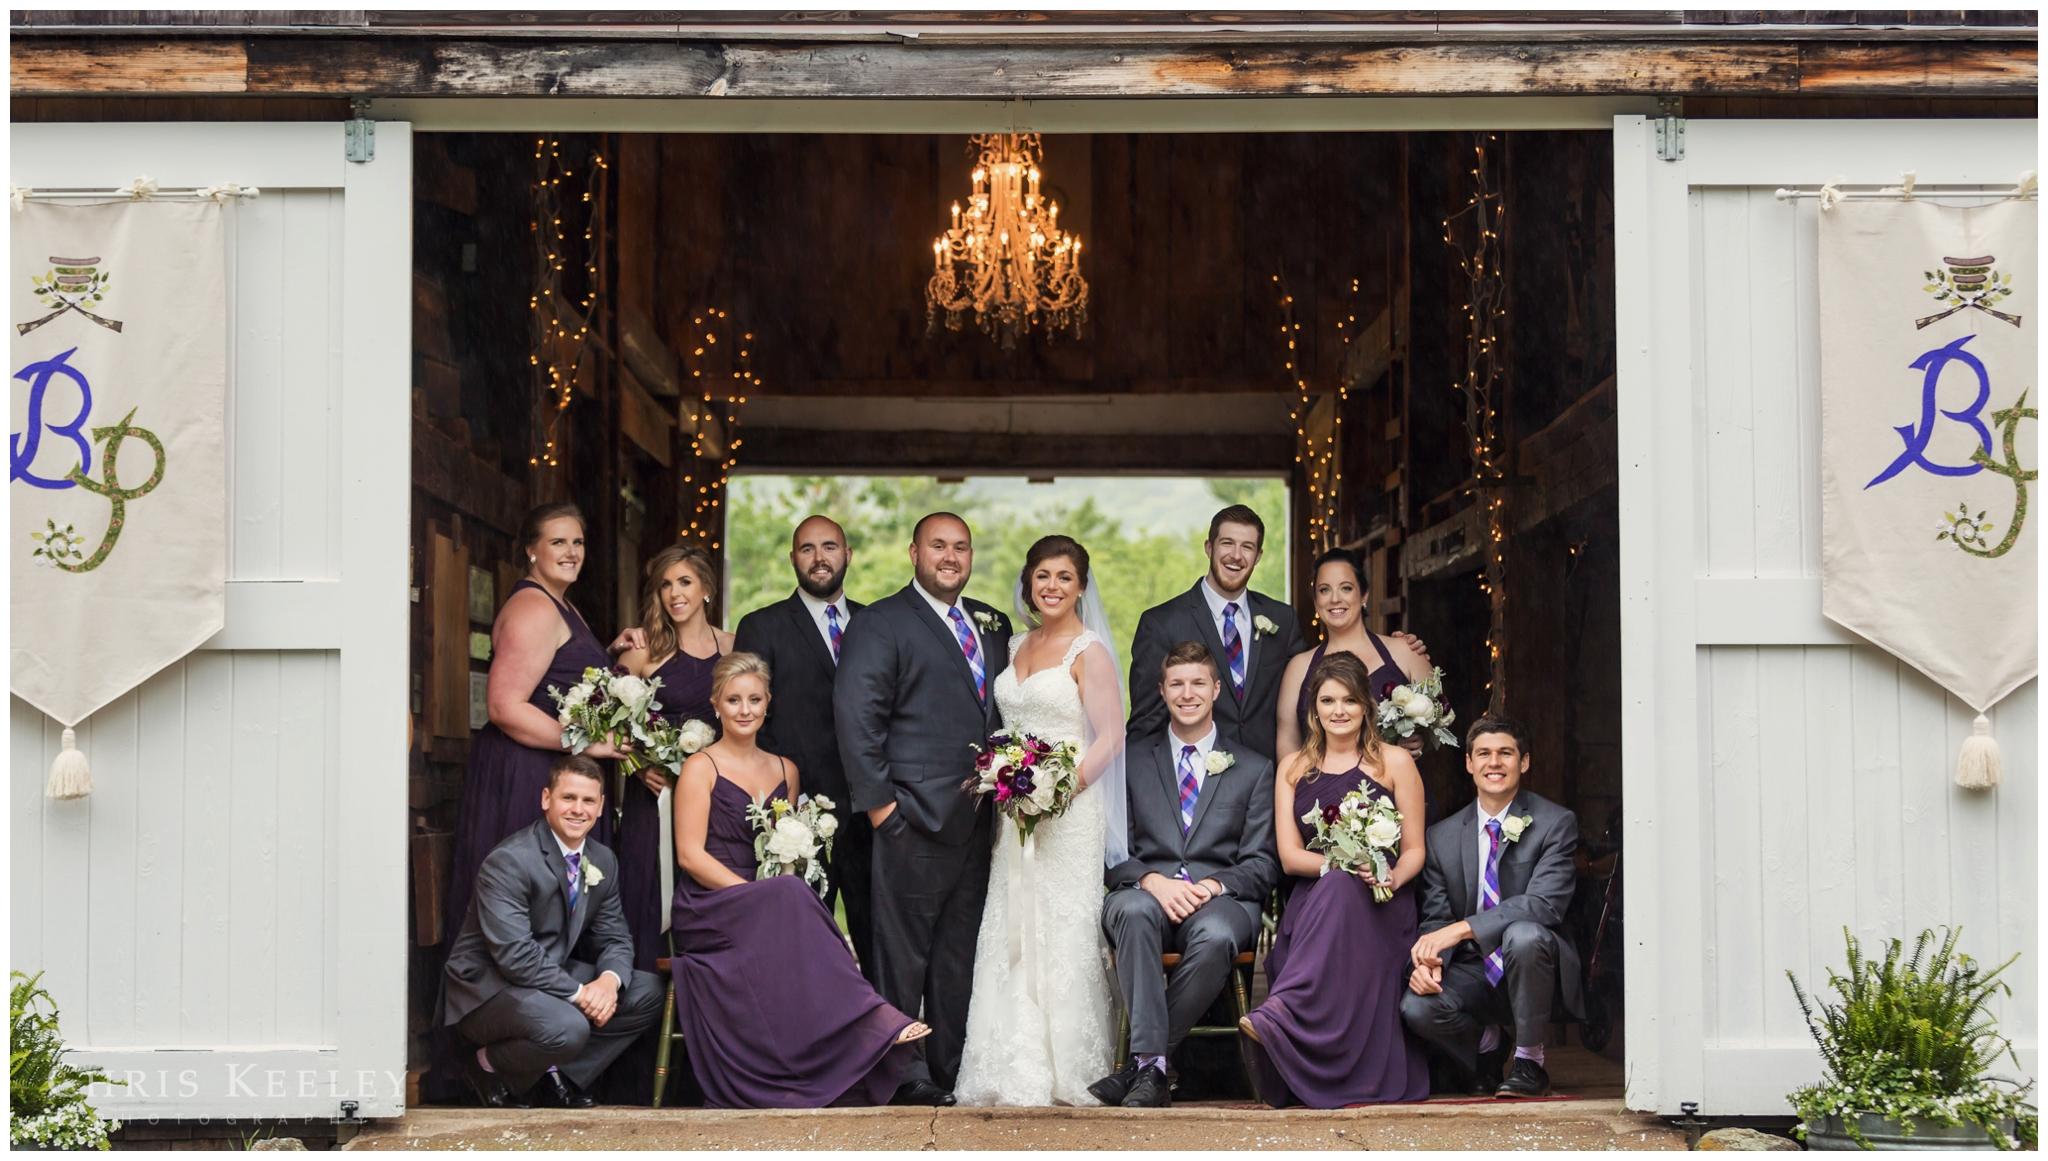 burrows-new-hampshire-wedding-01.jpg